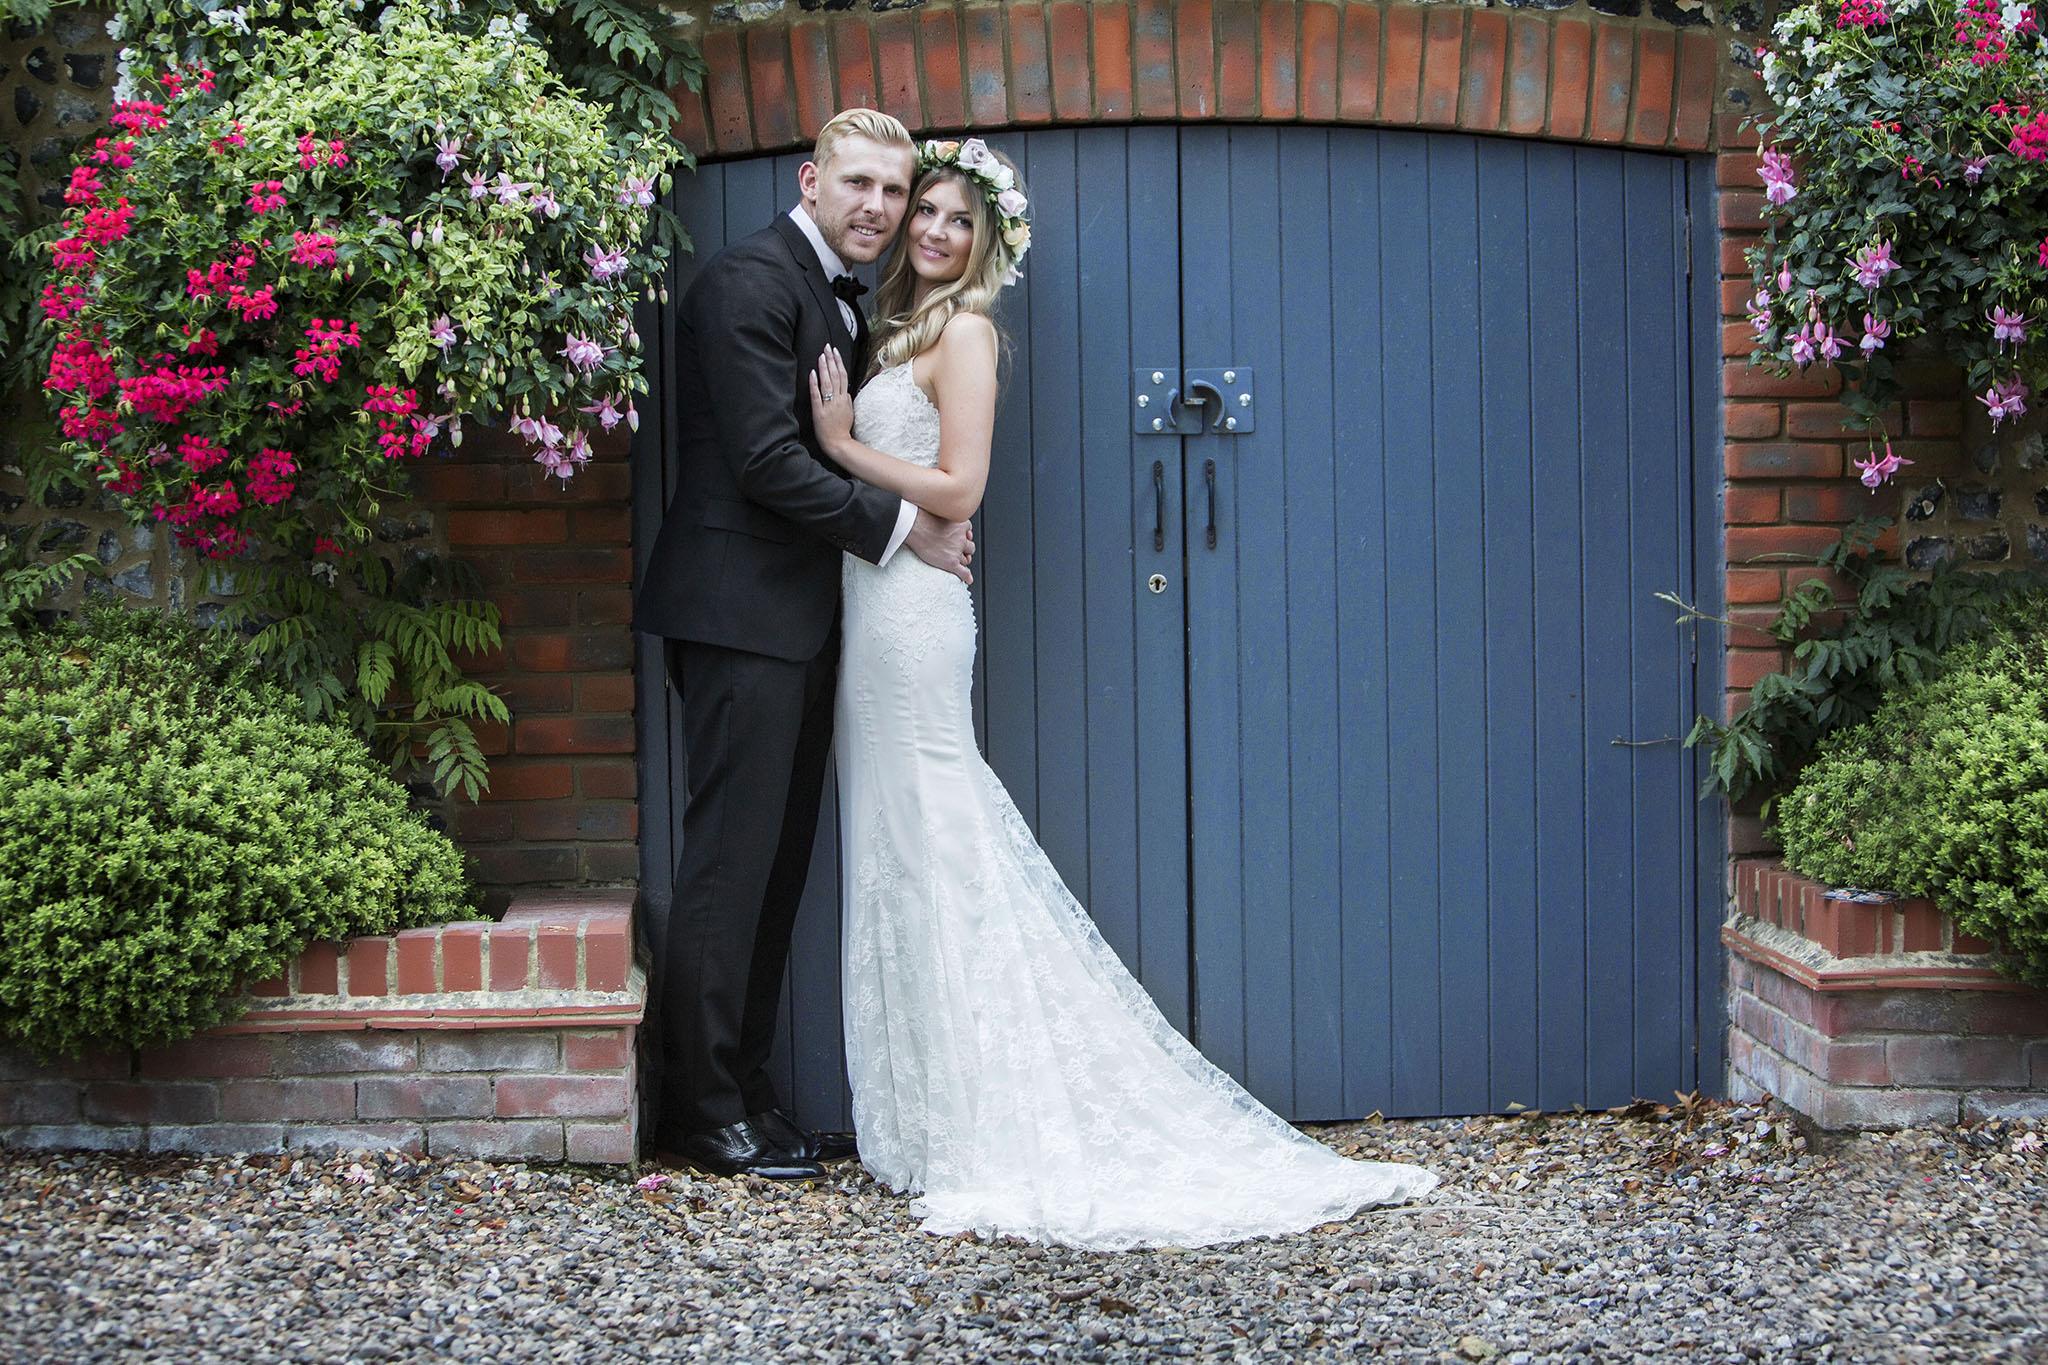 elizabethgphotography_kingslangley_hertfordshire_fineart_wedding_stmichaelsmanor_hotel_stalbans_luciejack_32.jpg